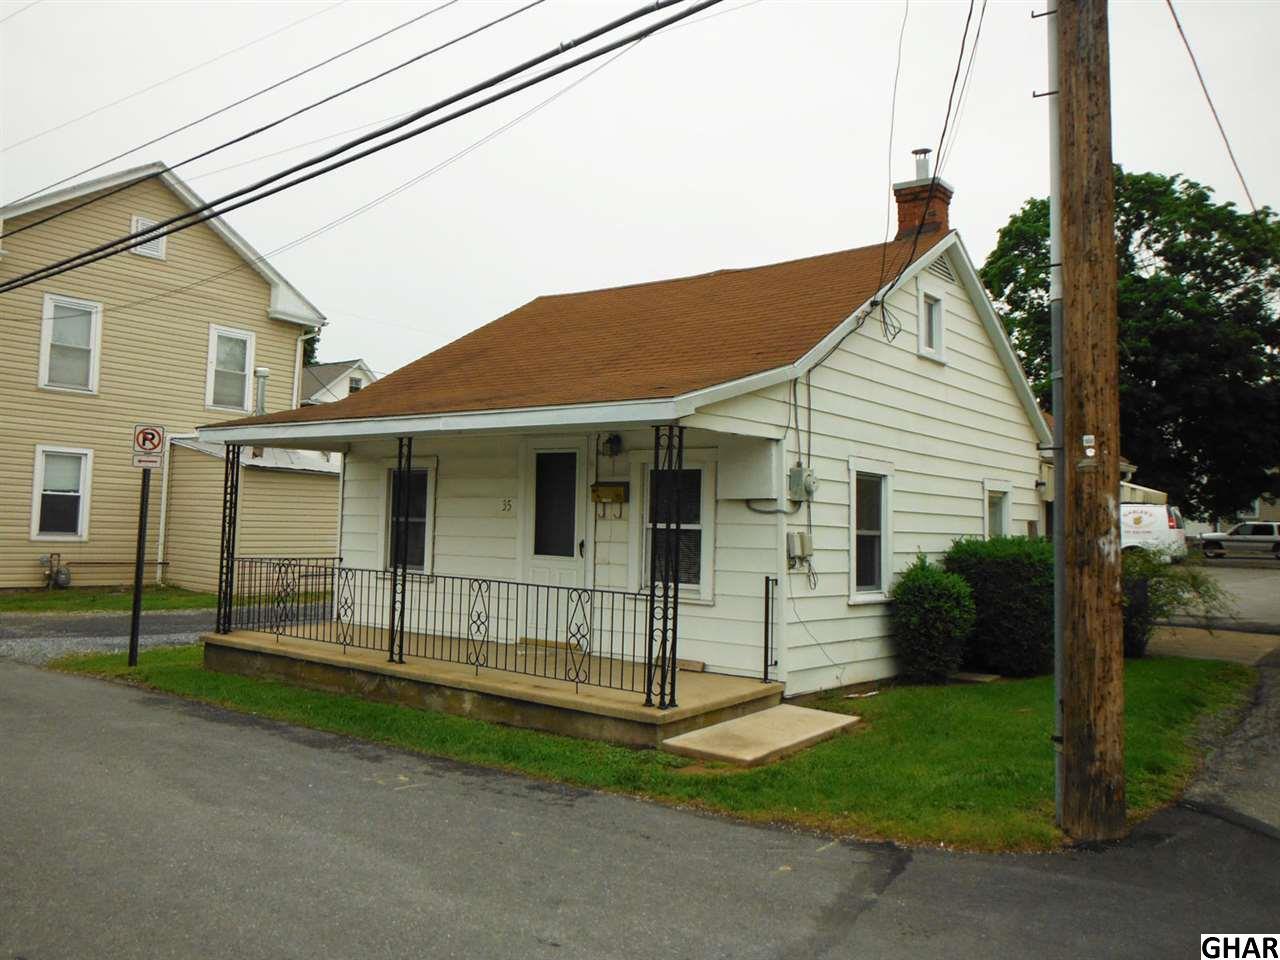 35 N Seneca St, Shippensburg, PA 17257